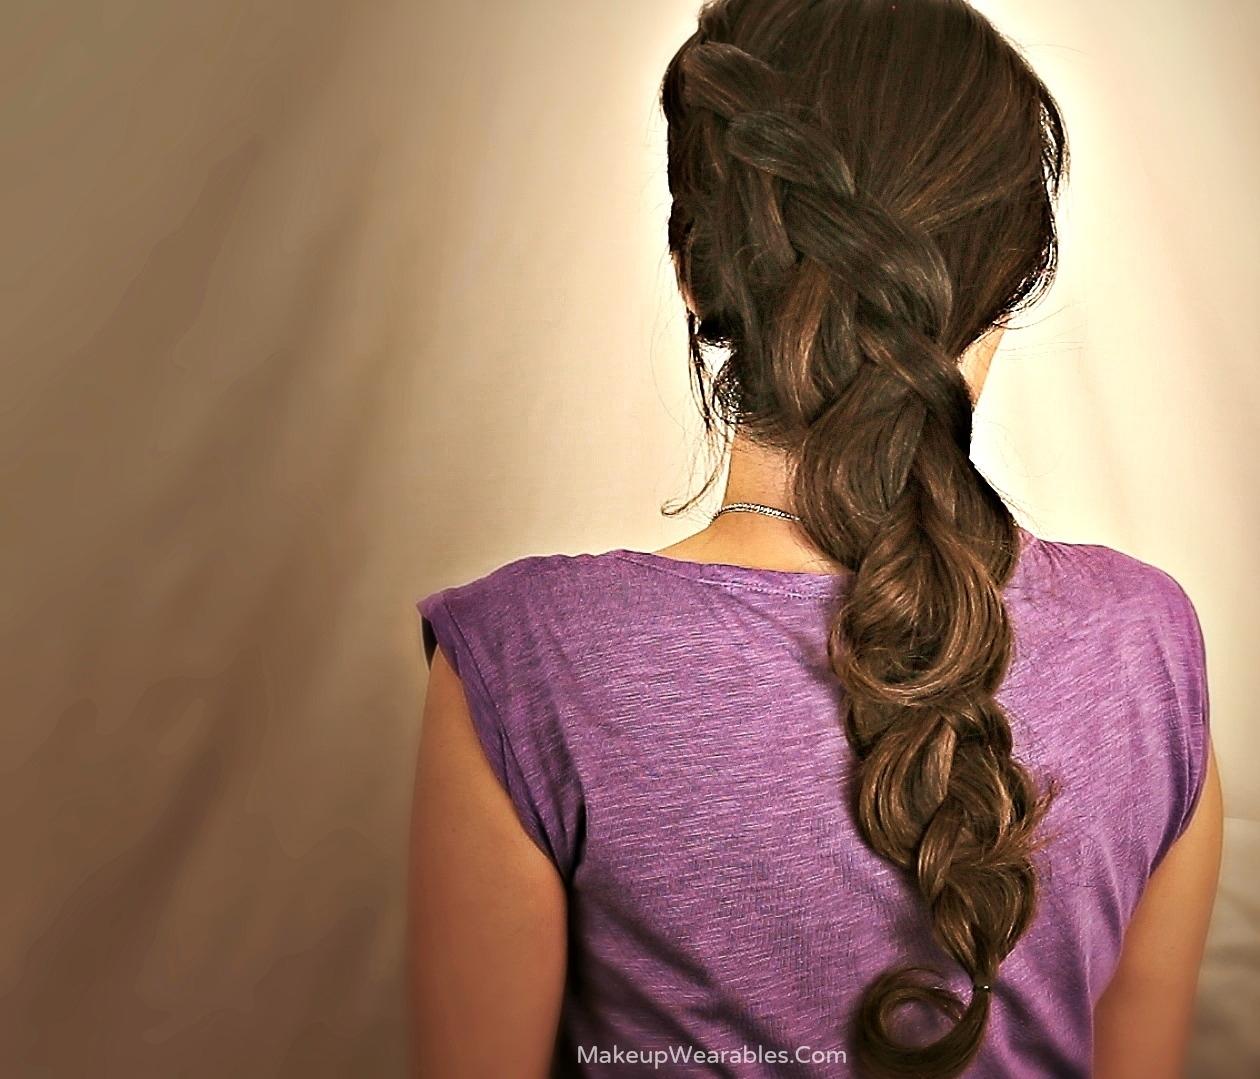 Hair tutorial katniss braid hairstyles amp updos for medium long hair